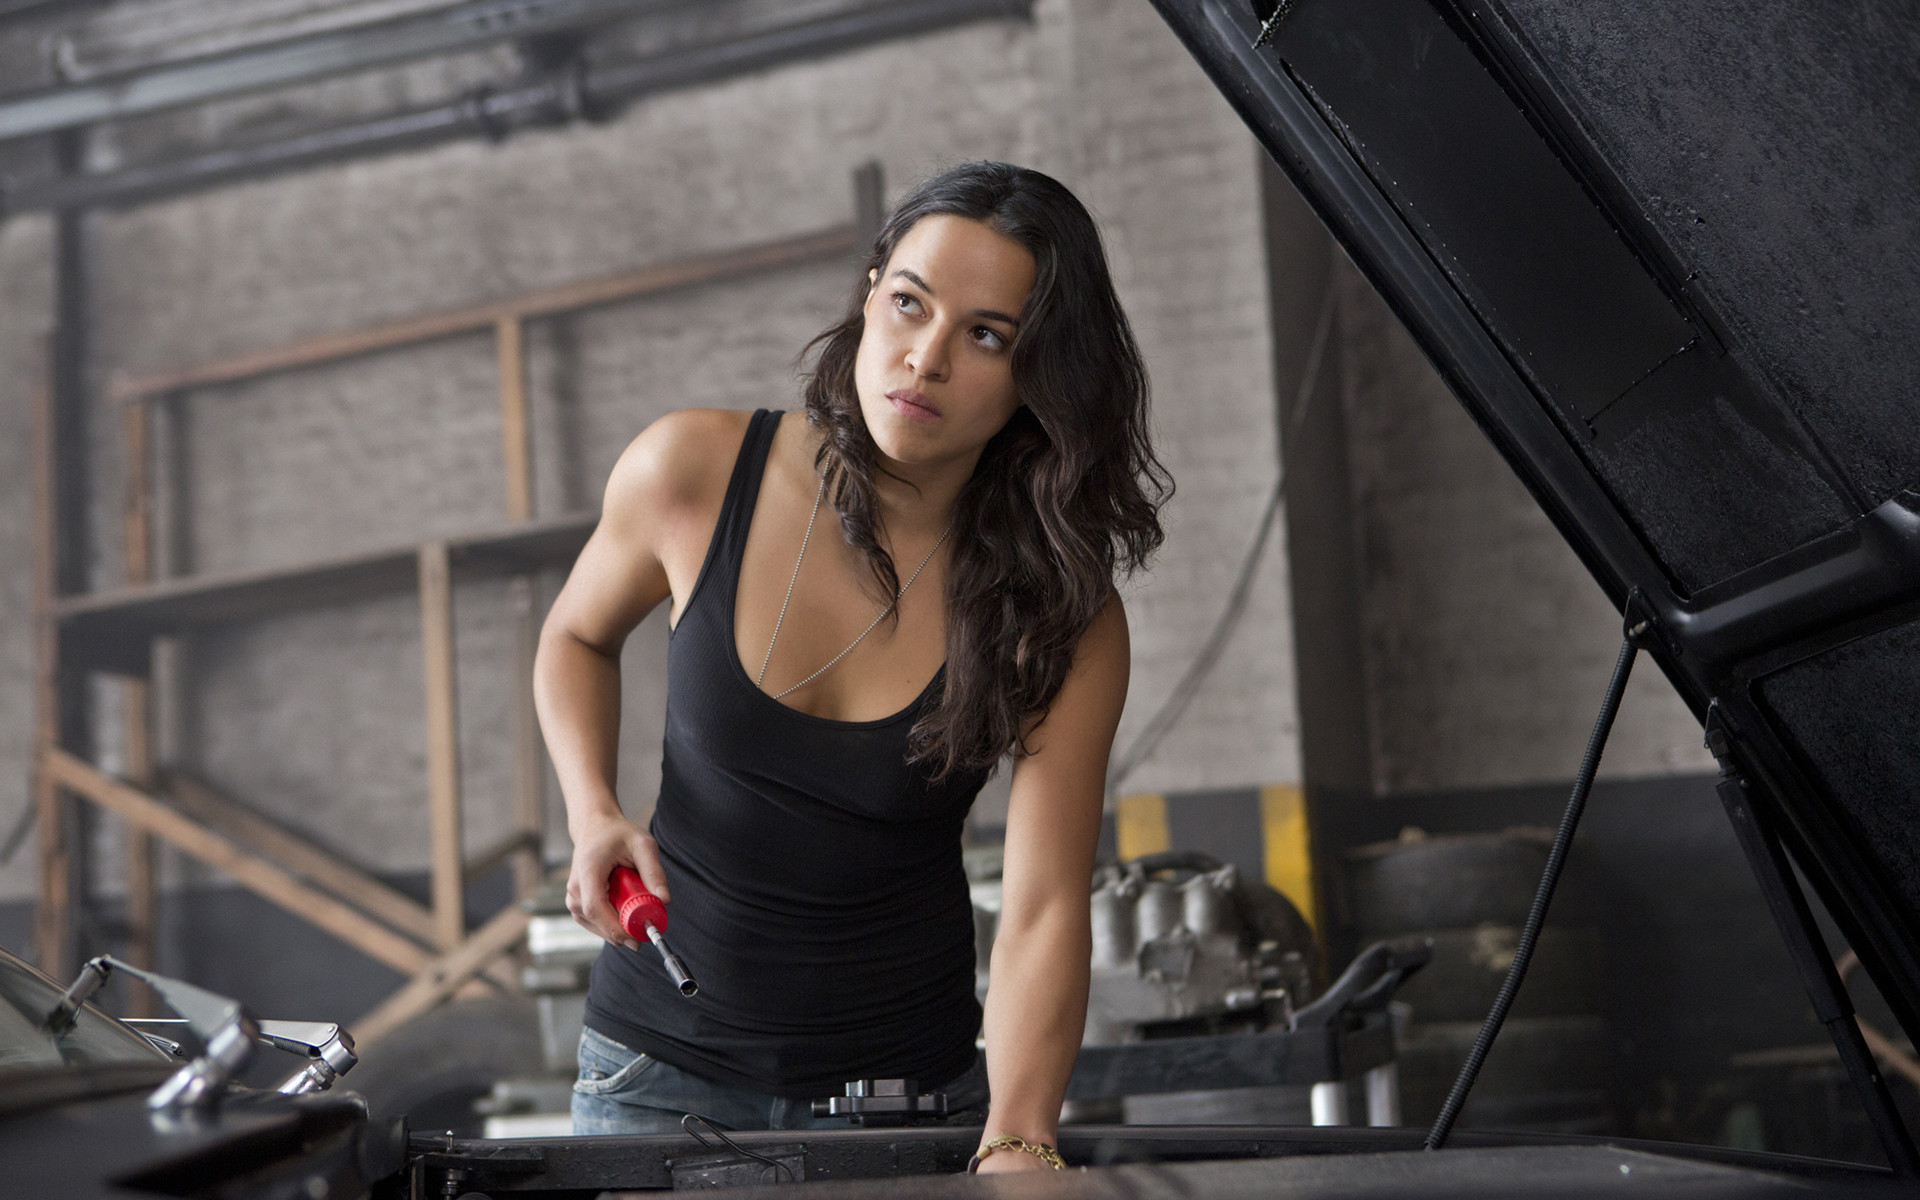 Fast Furious 6 Michelle Rodriguez Desktop Wallpaper